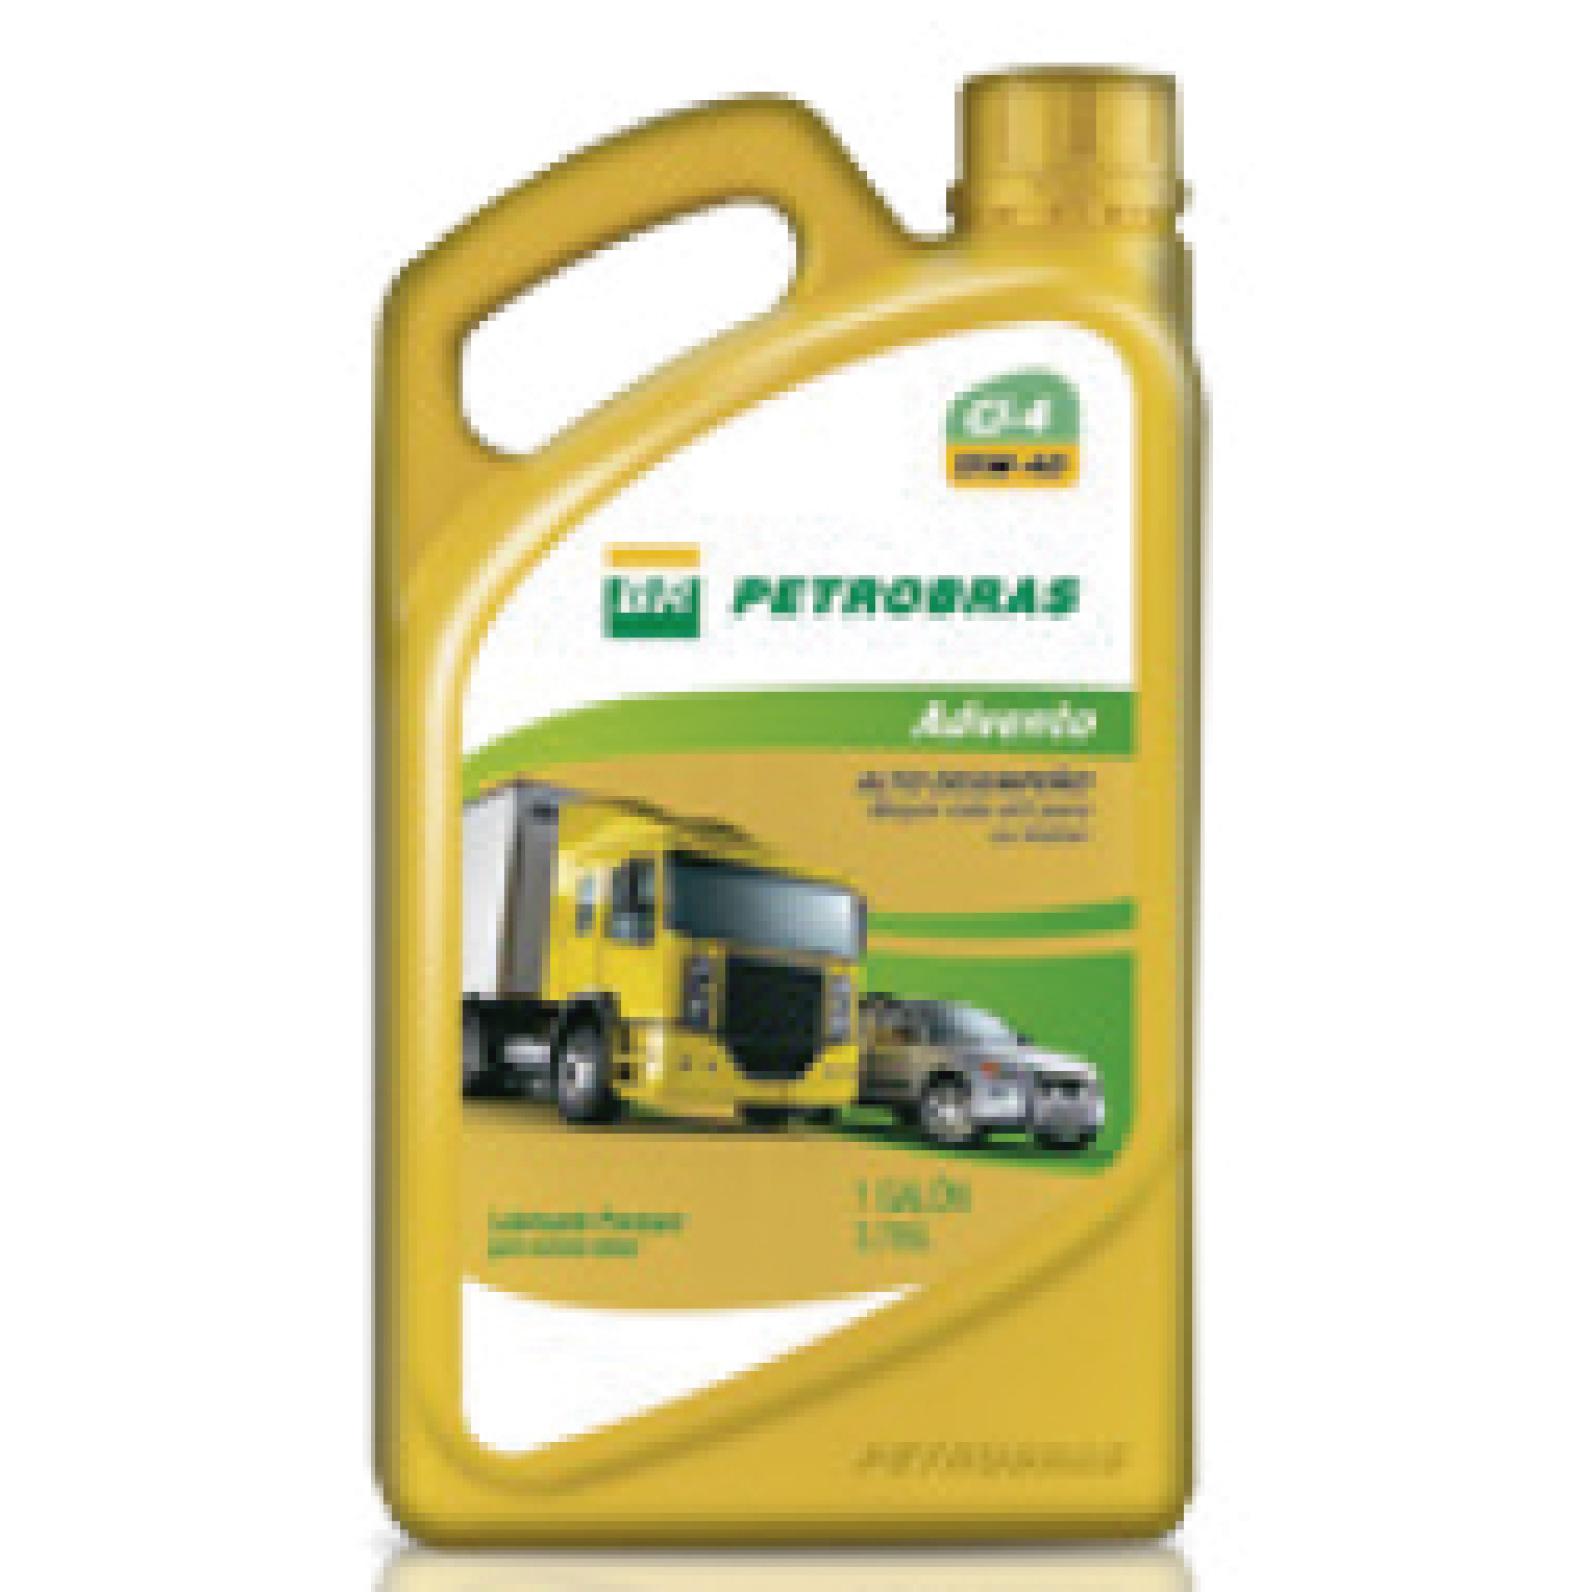 Lubricante Petrobras Advento (Motor Diésel)